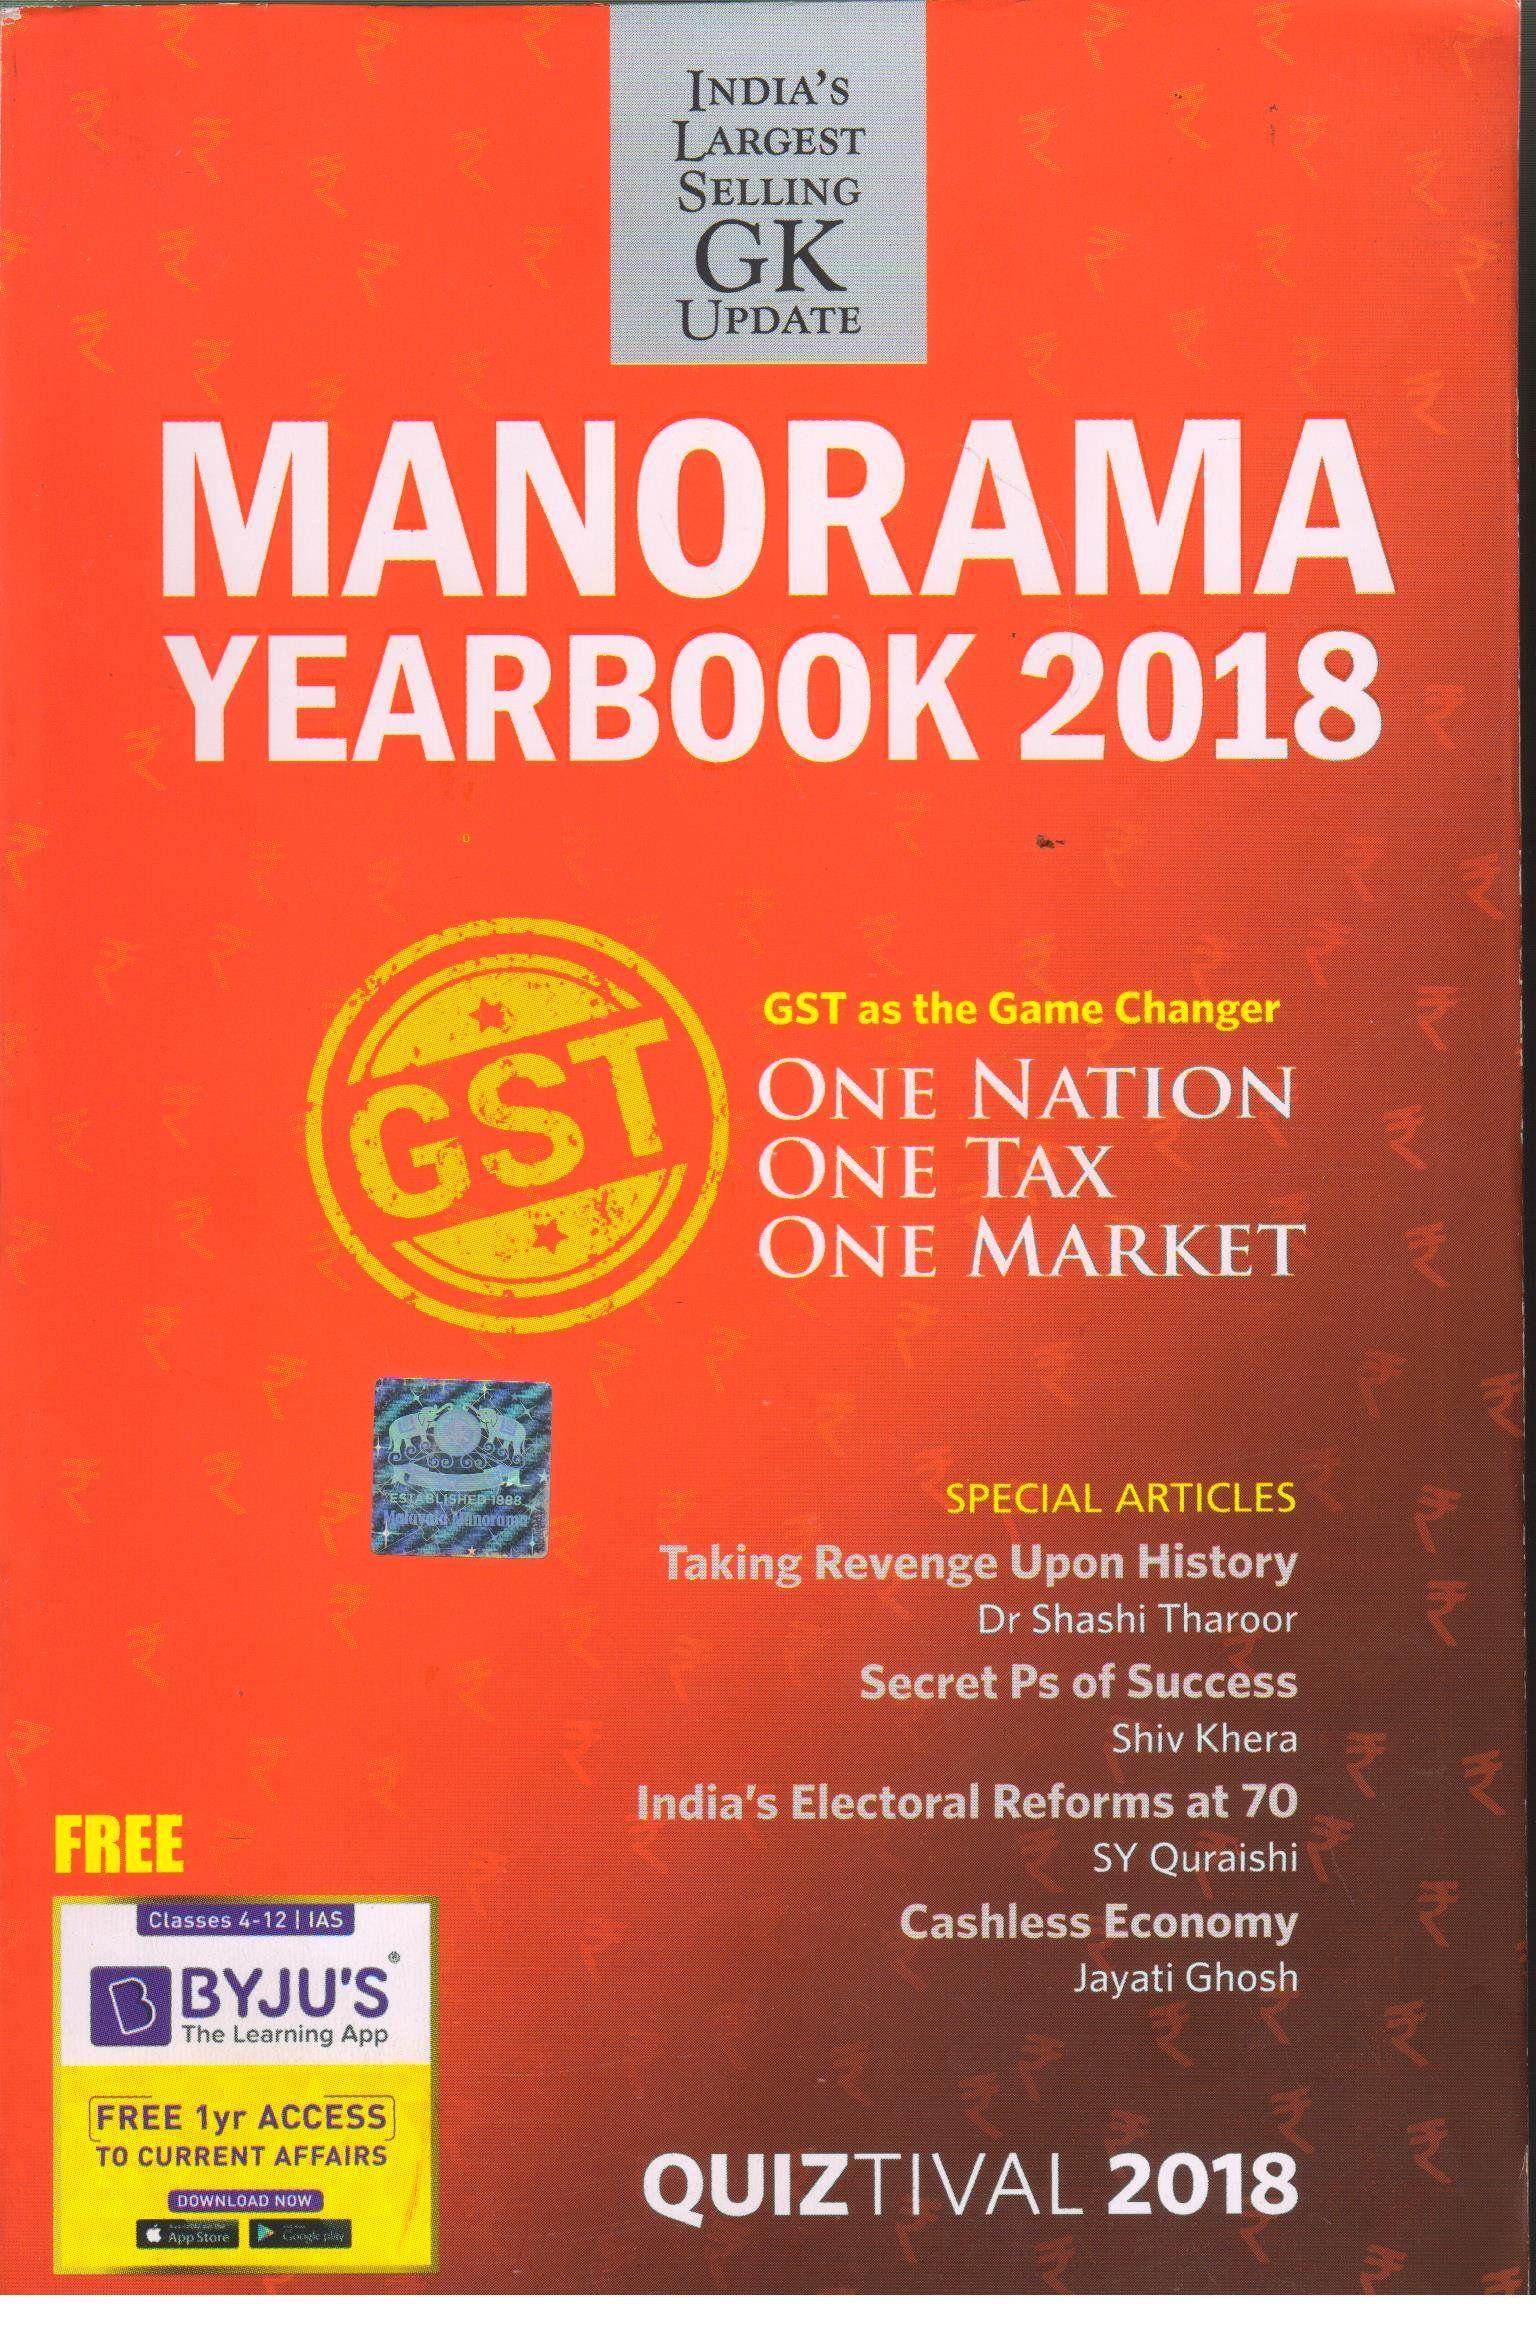 Manorama yearbook 2016 pdf free download by blacsauratax issuu.